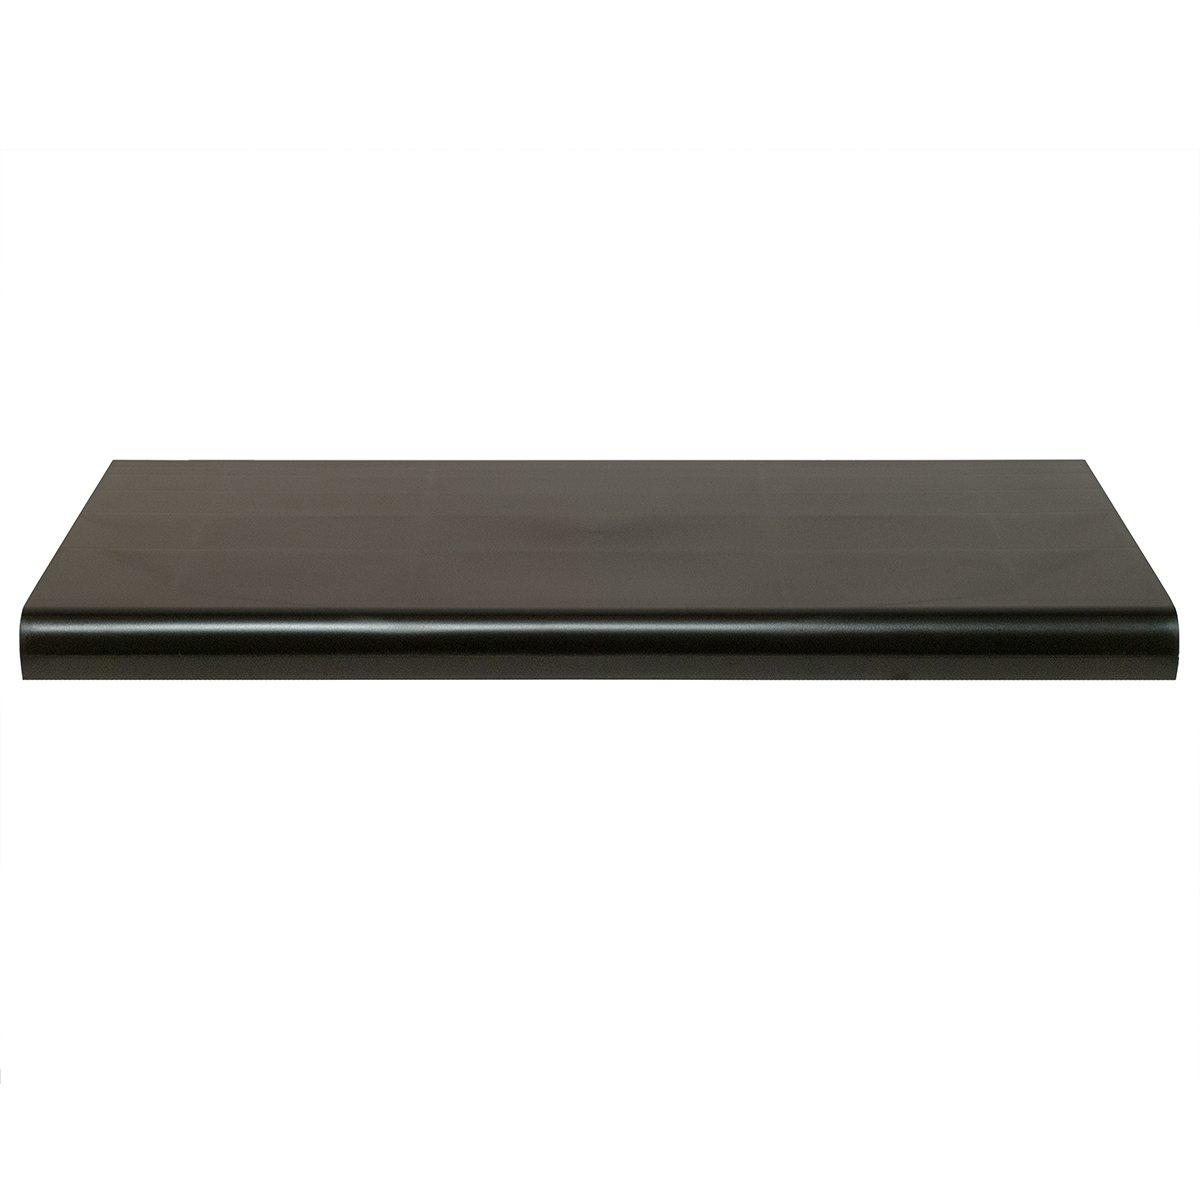 KC Store Fixtures 30310 Shelf Bullnose, 24'' Length,  13'' Width, 4 Shelf, Plastic, Black (Pack of 4)